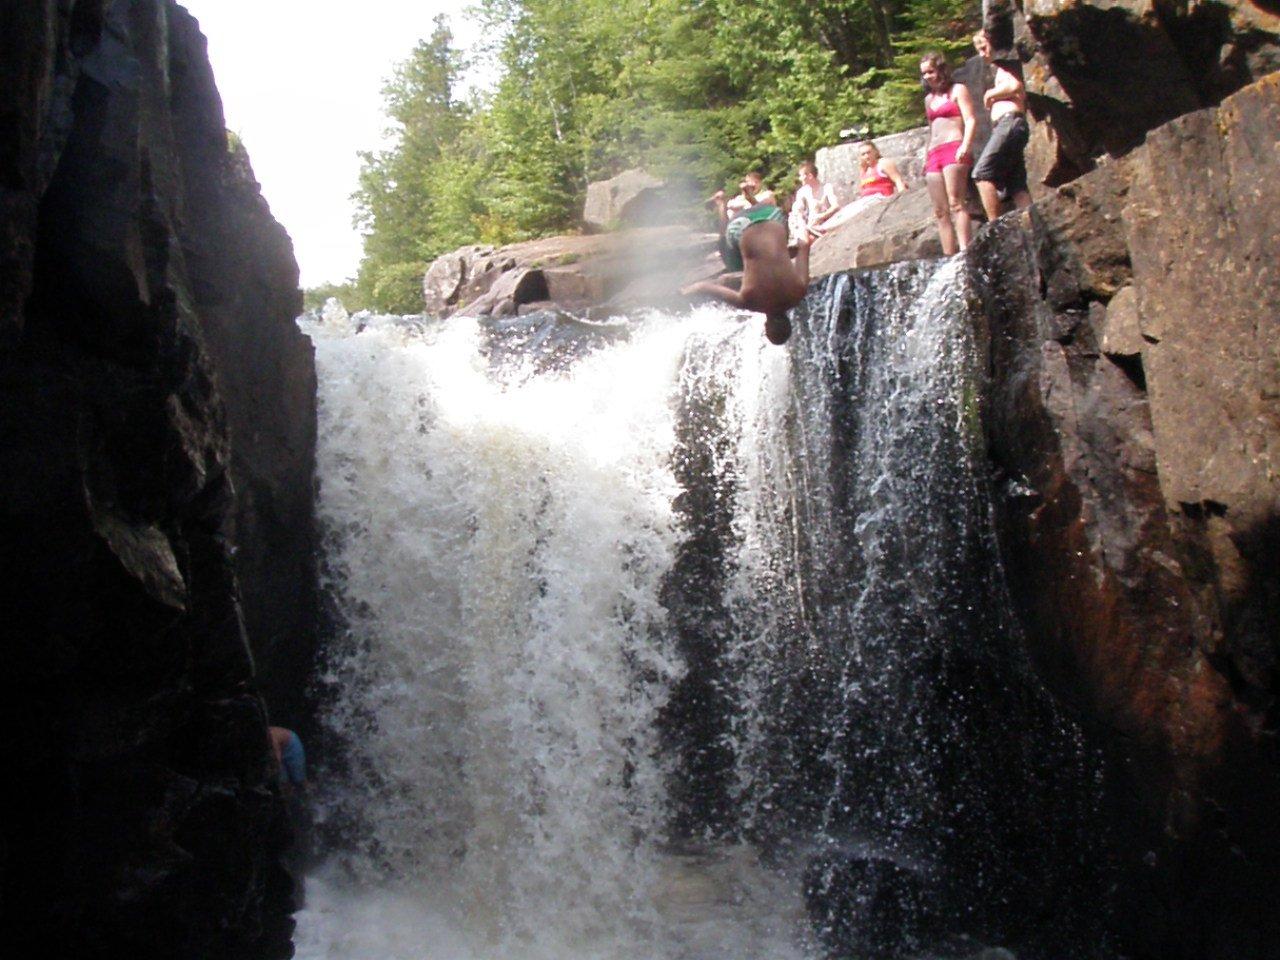 Gainer at mackenzie Falls